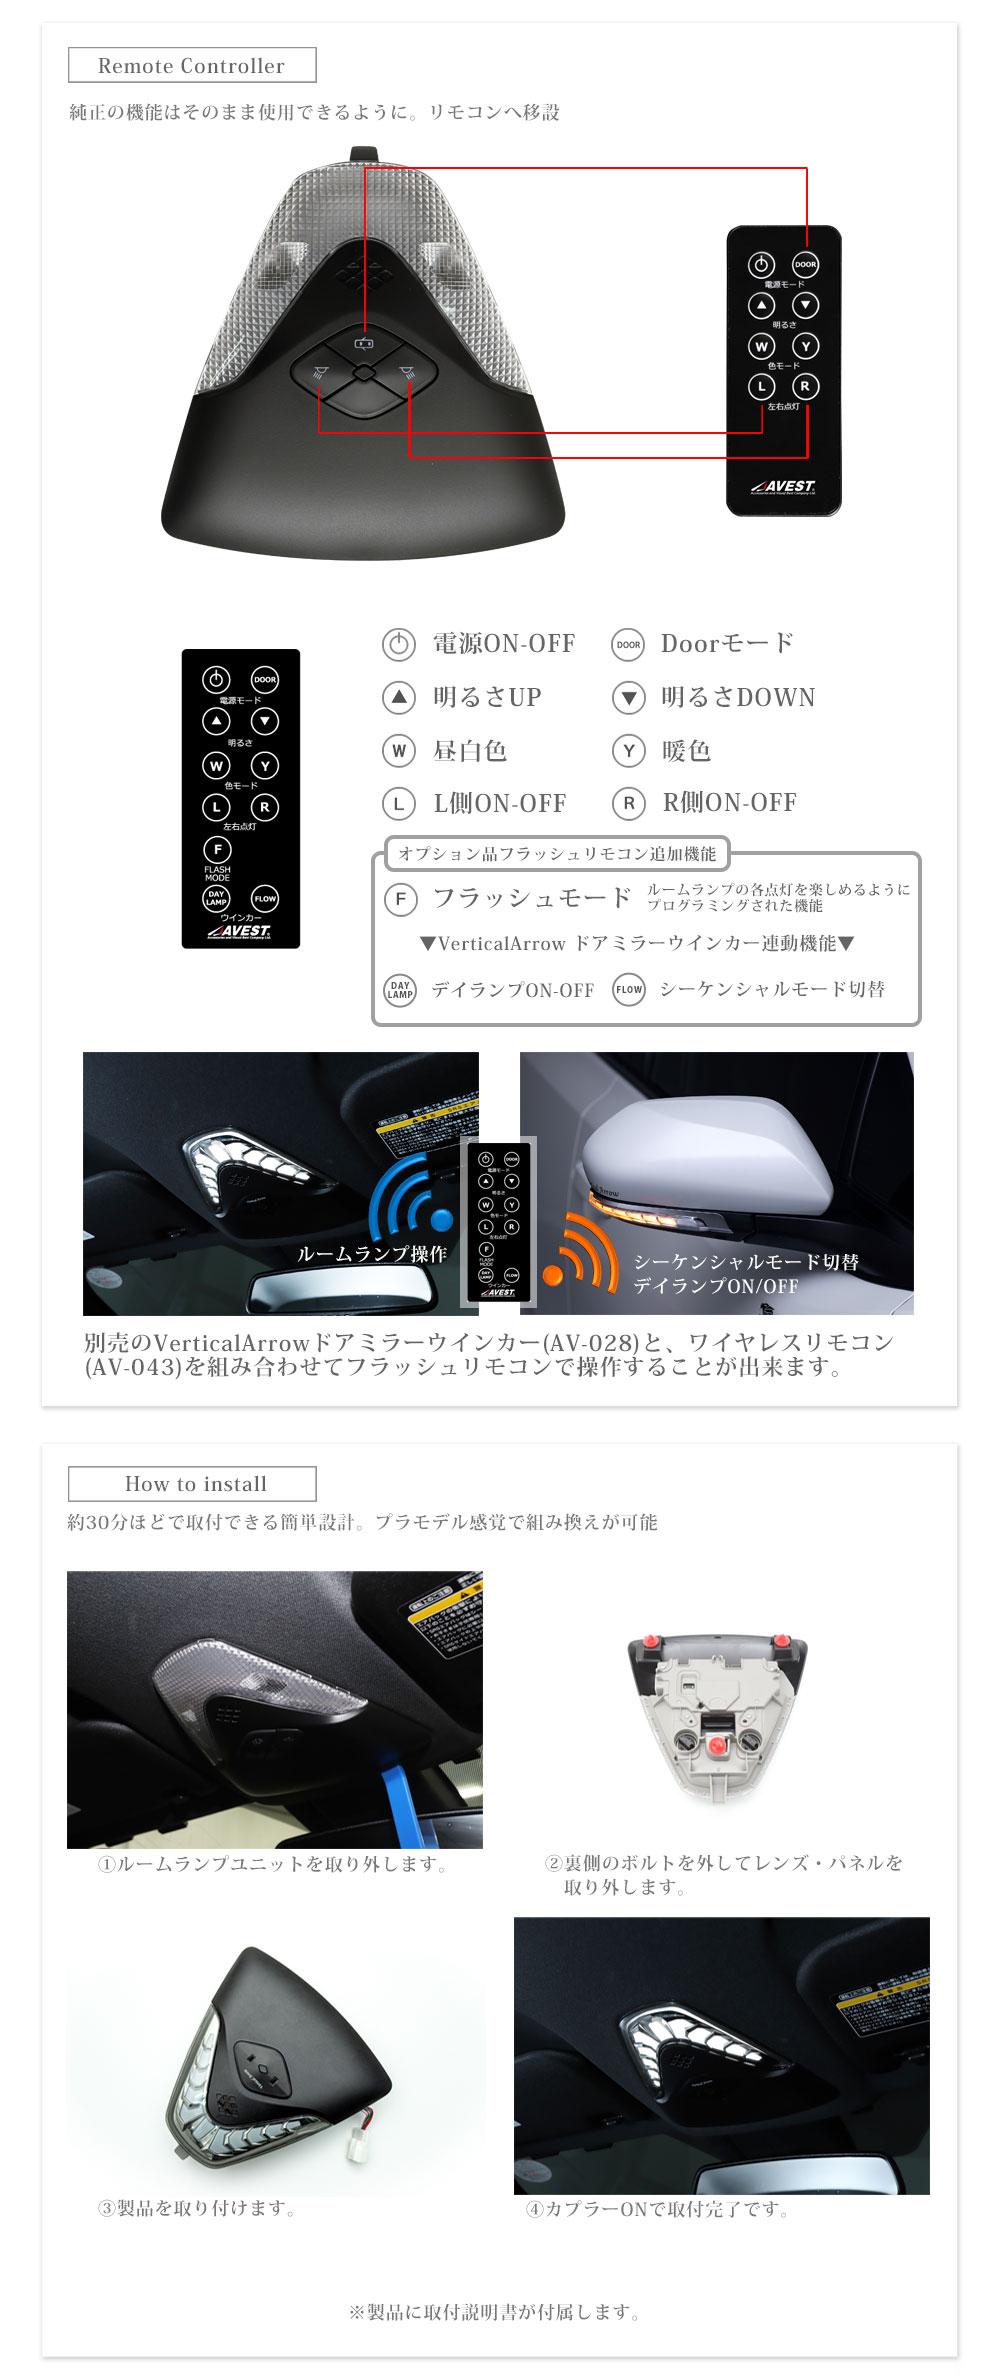 C-HR用LEDルームランプ対応/AVESTVerticalArrowLEDルームランプユニット